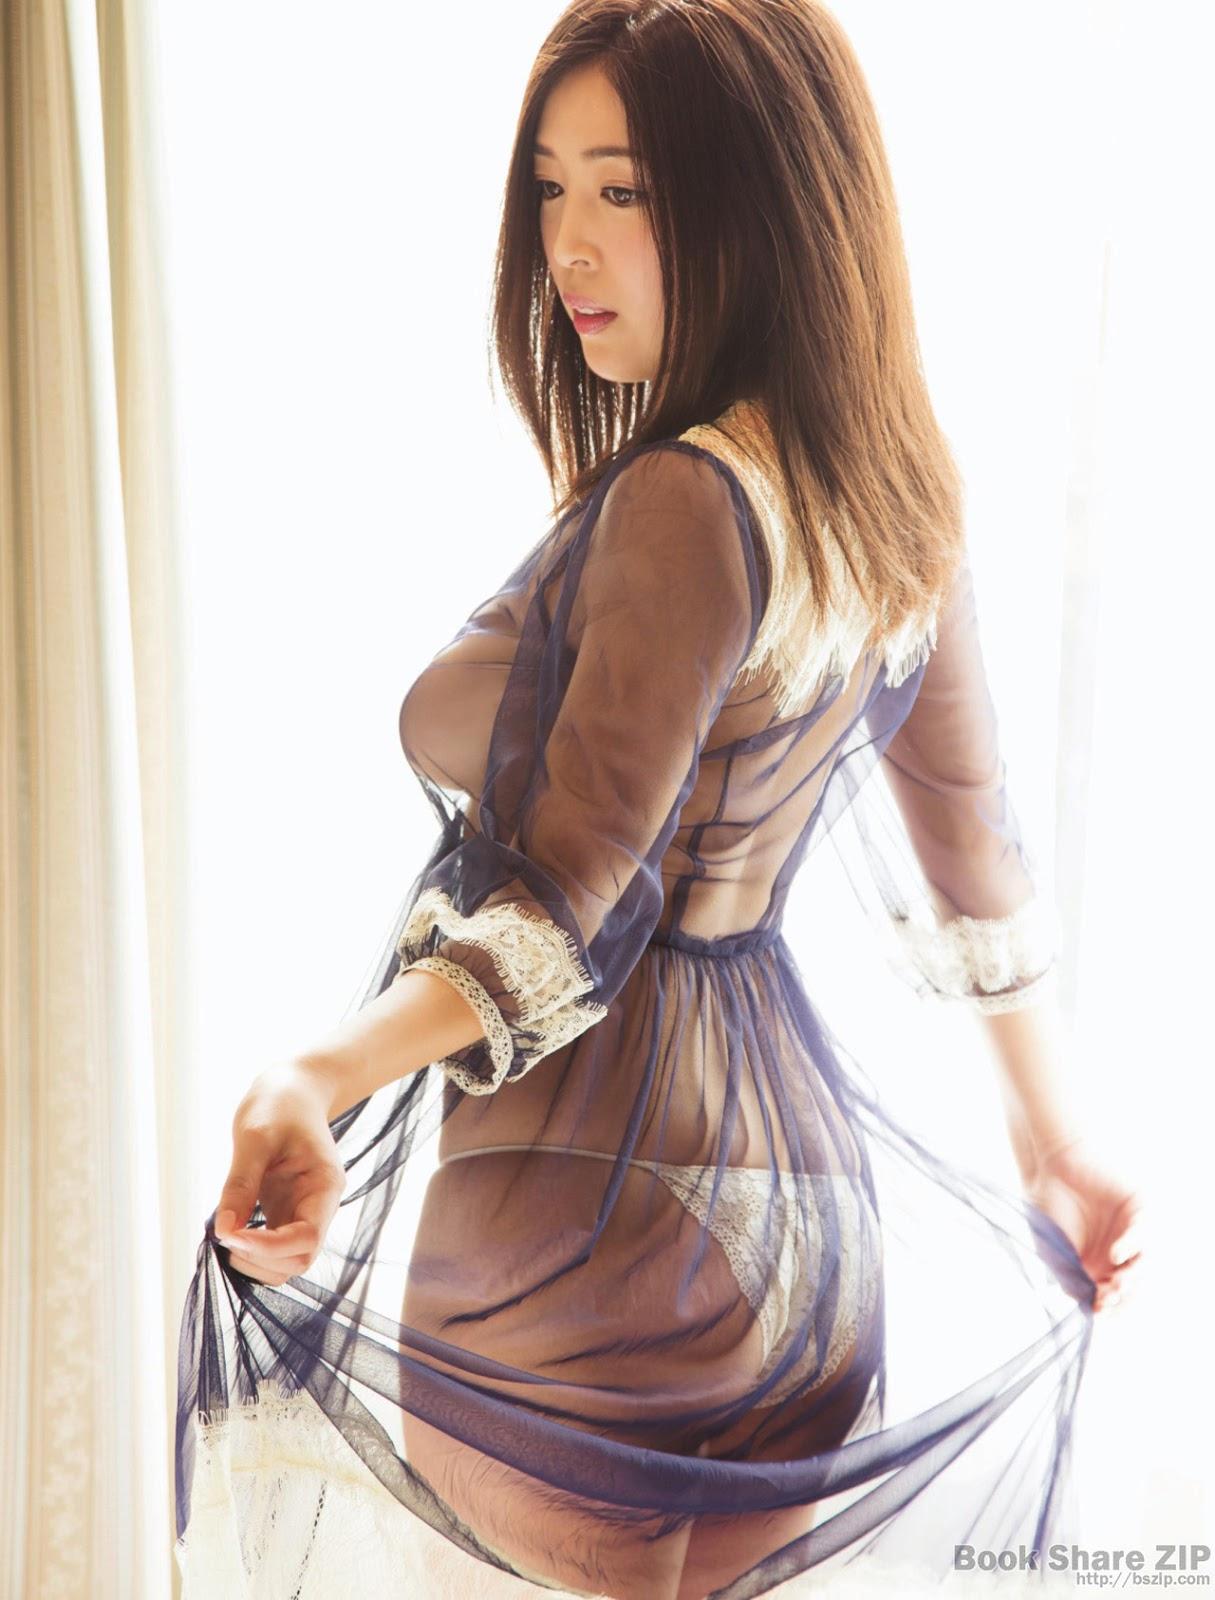 Machiko Tezuka 手束真知子, Weekly SPA! 2017.12.19 (週刊SPA! 2017年12月19日号)